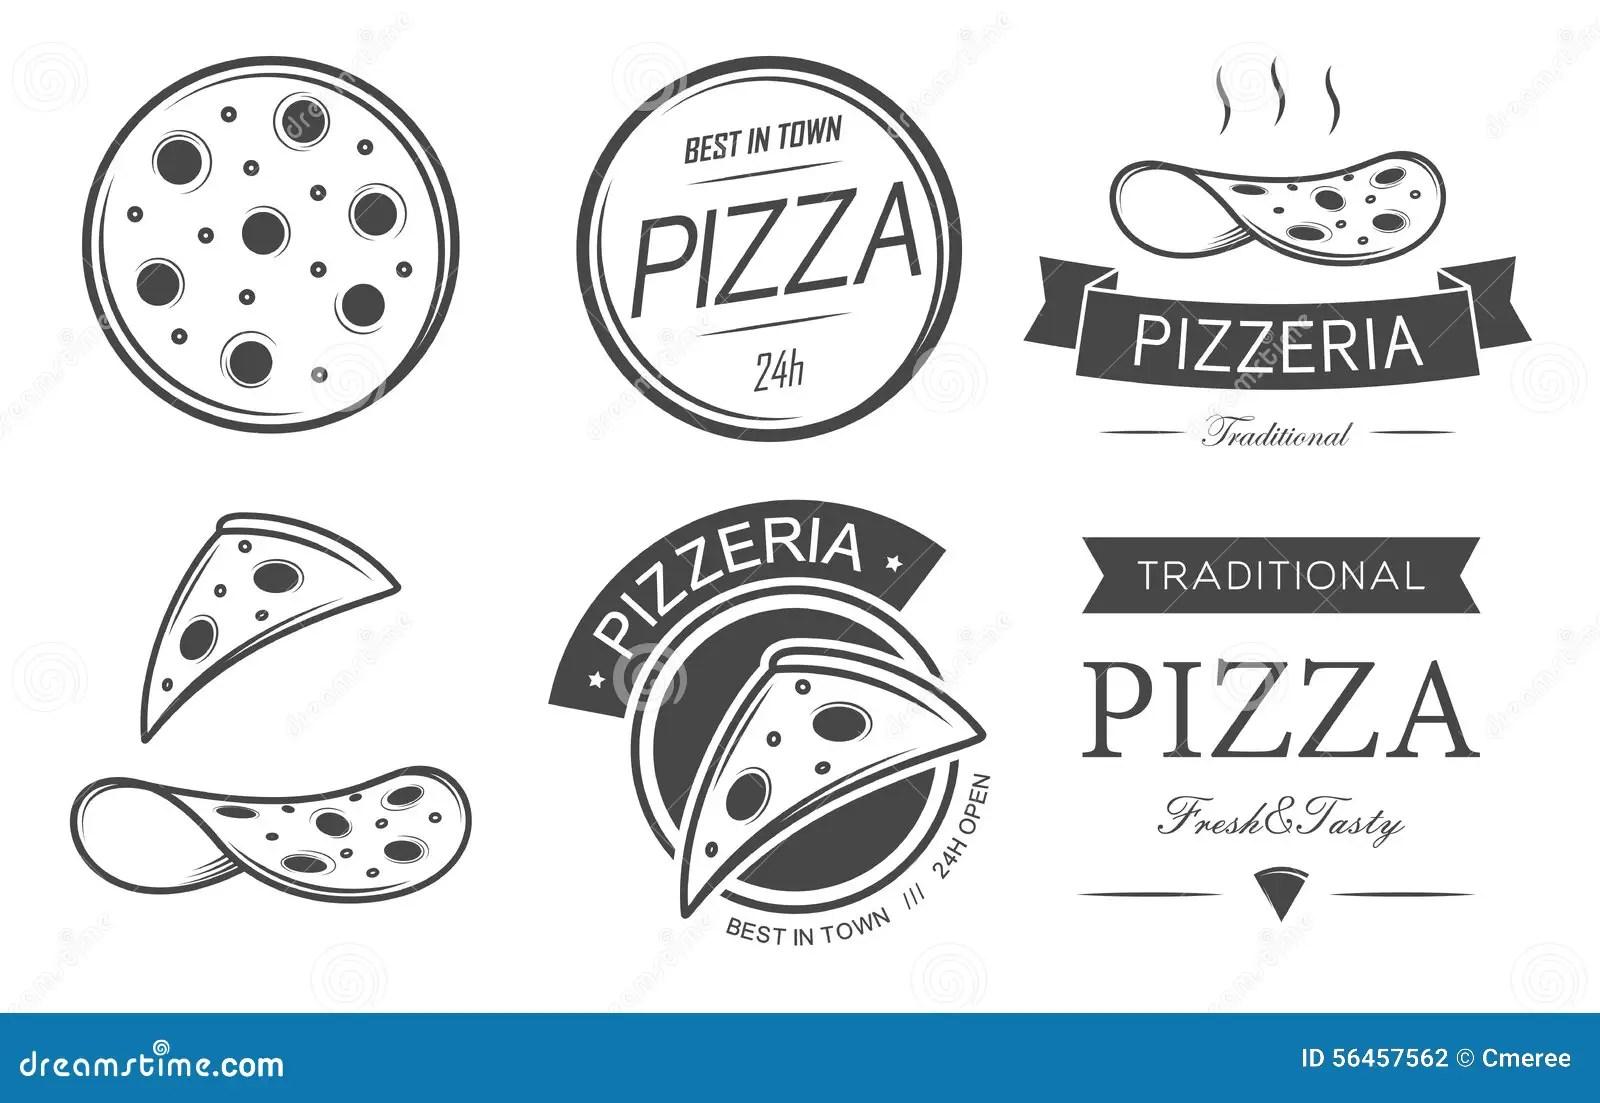 Pizza Set Stock Vector